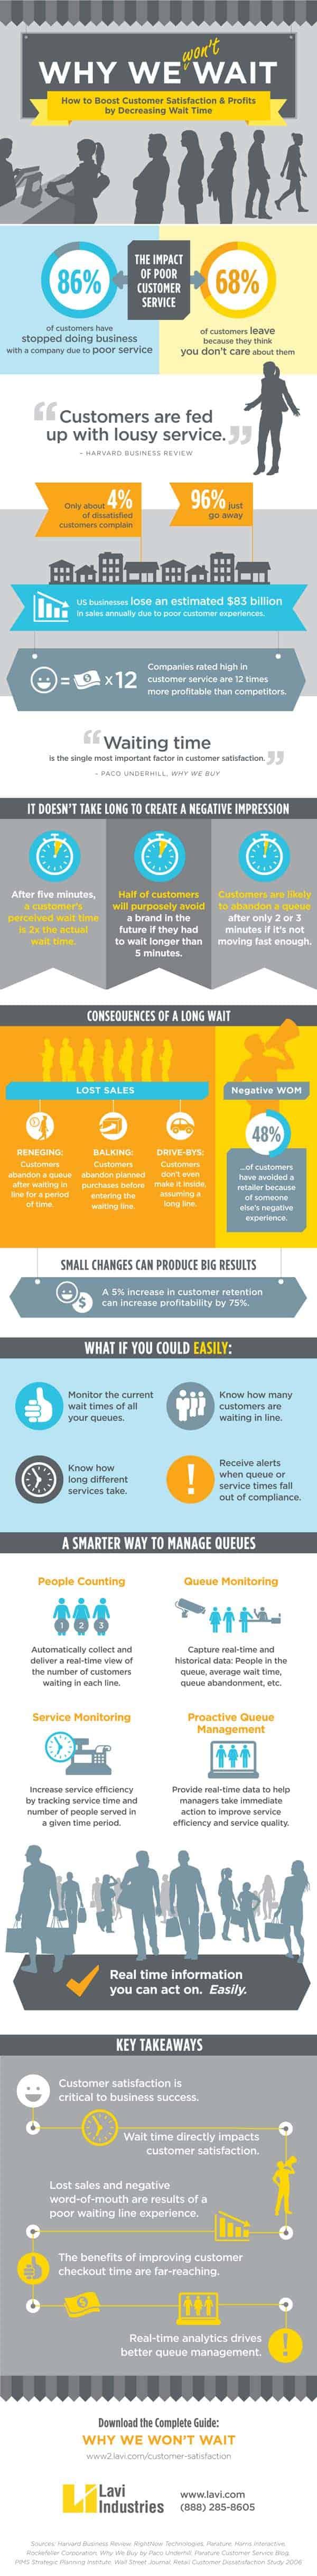 Why-We-Wont-Wait-Queue-Management-Infographic1